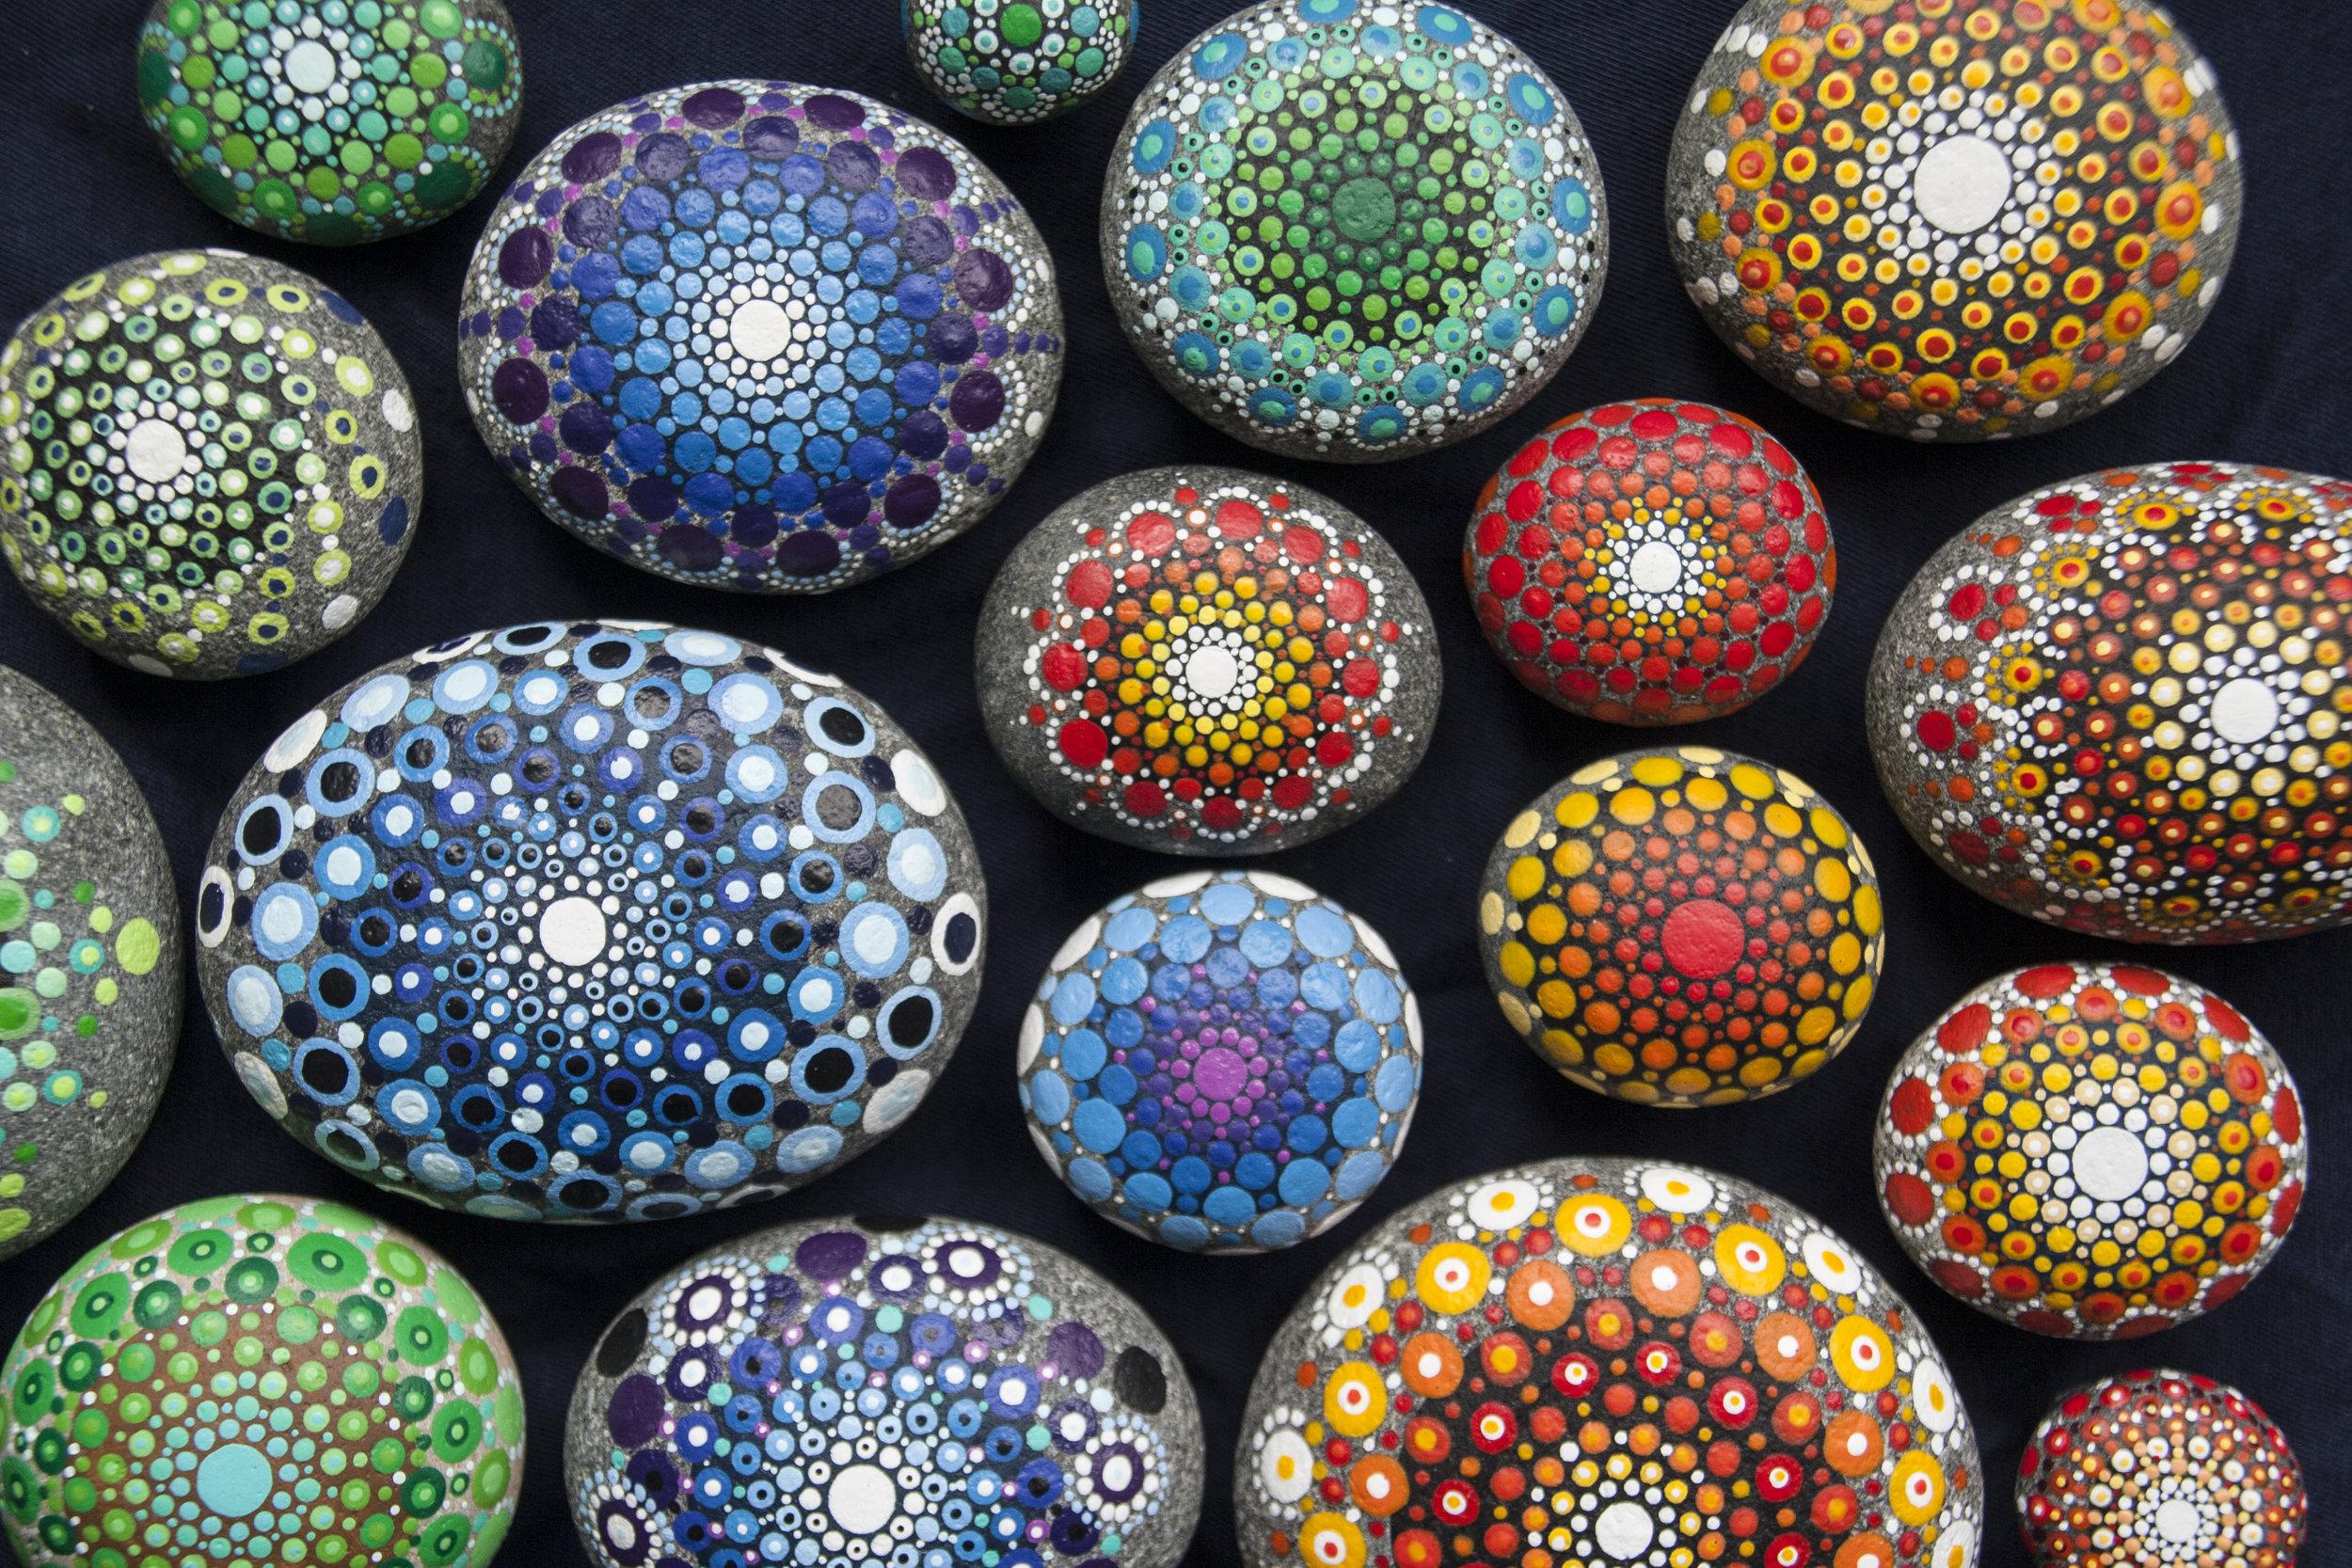 Cover photo mandala stones grenier.jpg